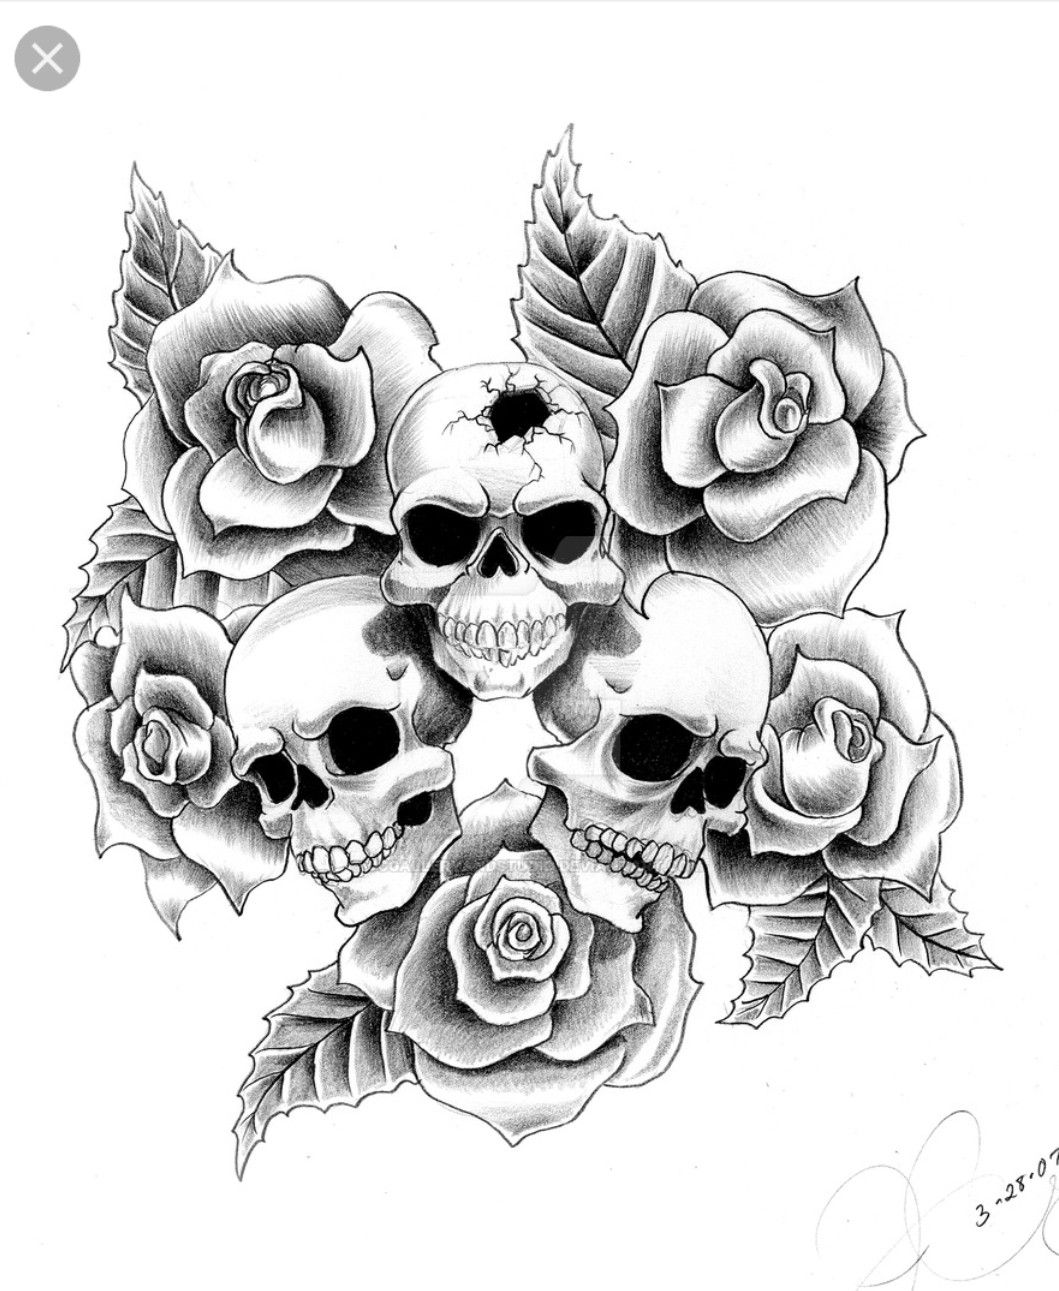 pin von artiimoiis auf b ren totenkopf tattoo ideen. Black Bedroom Furniture Sets. Home Design Ideas